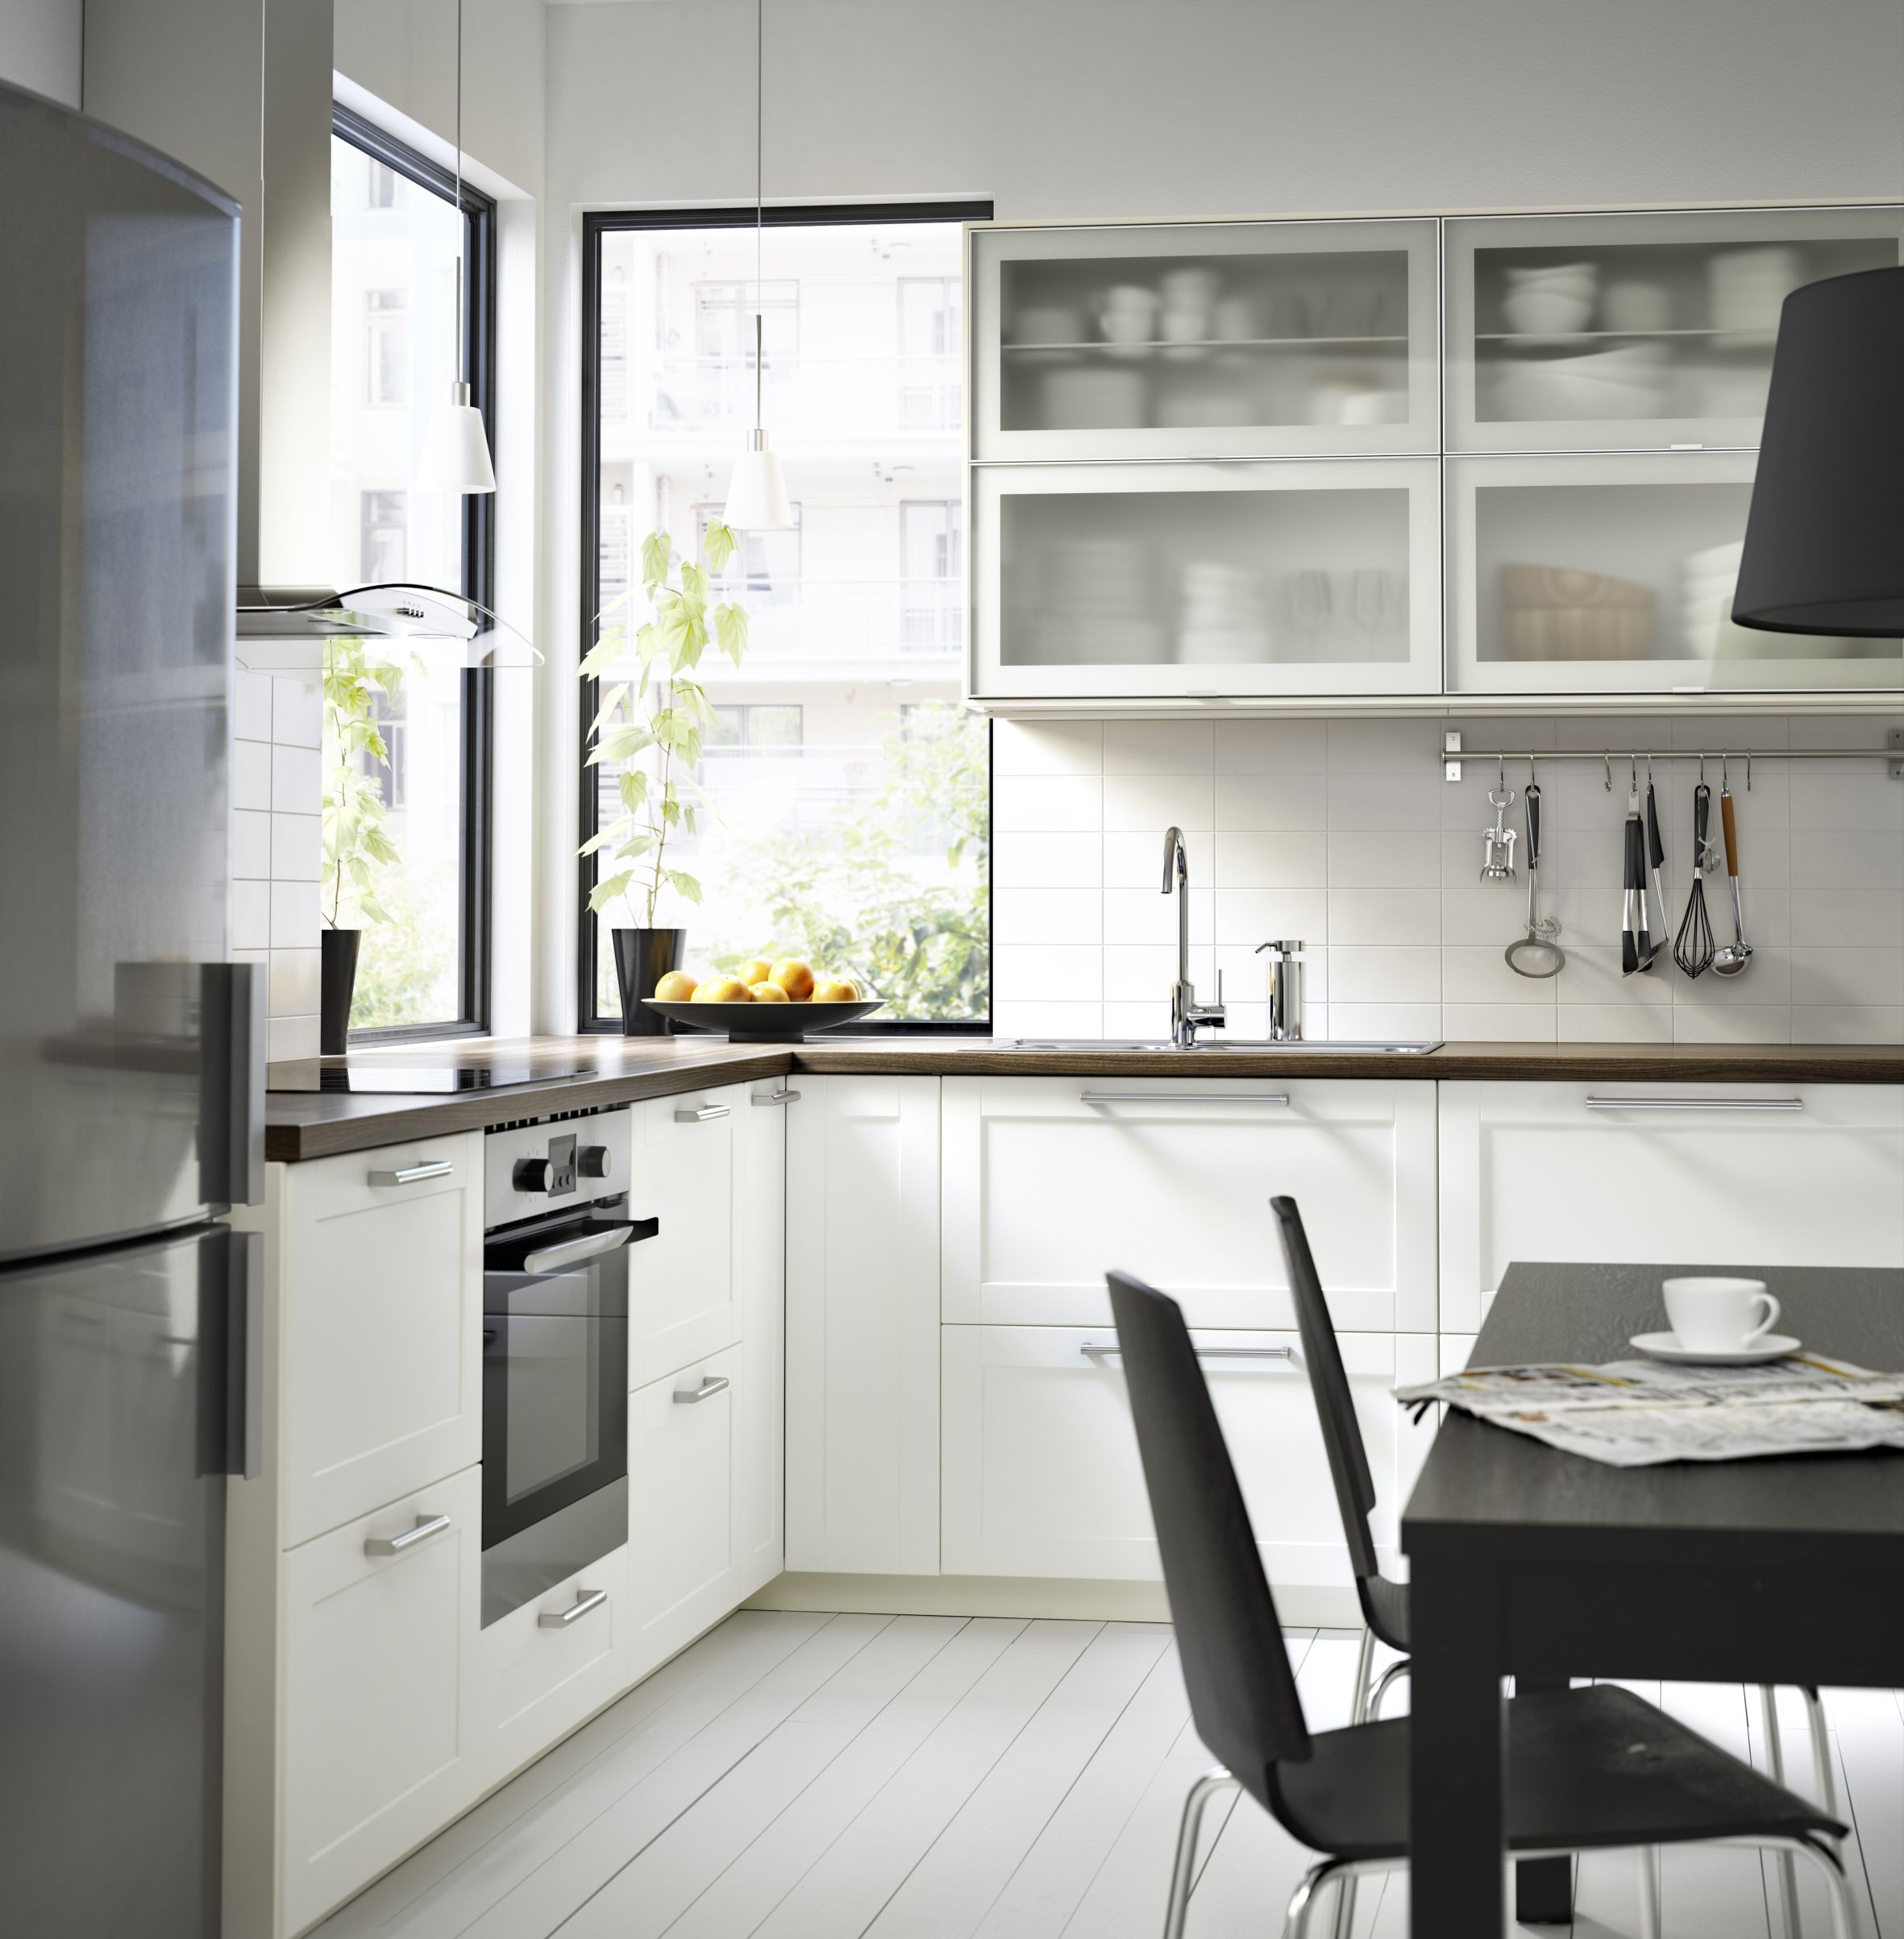 geef je fantasie de ruimte met ons nieuwe metod keukensysteem ikea keuken metod keukens. Black Bedroom Furniture Sets. Home Design Ideas